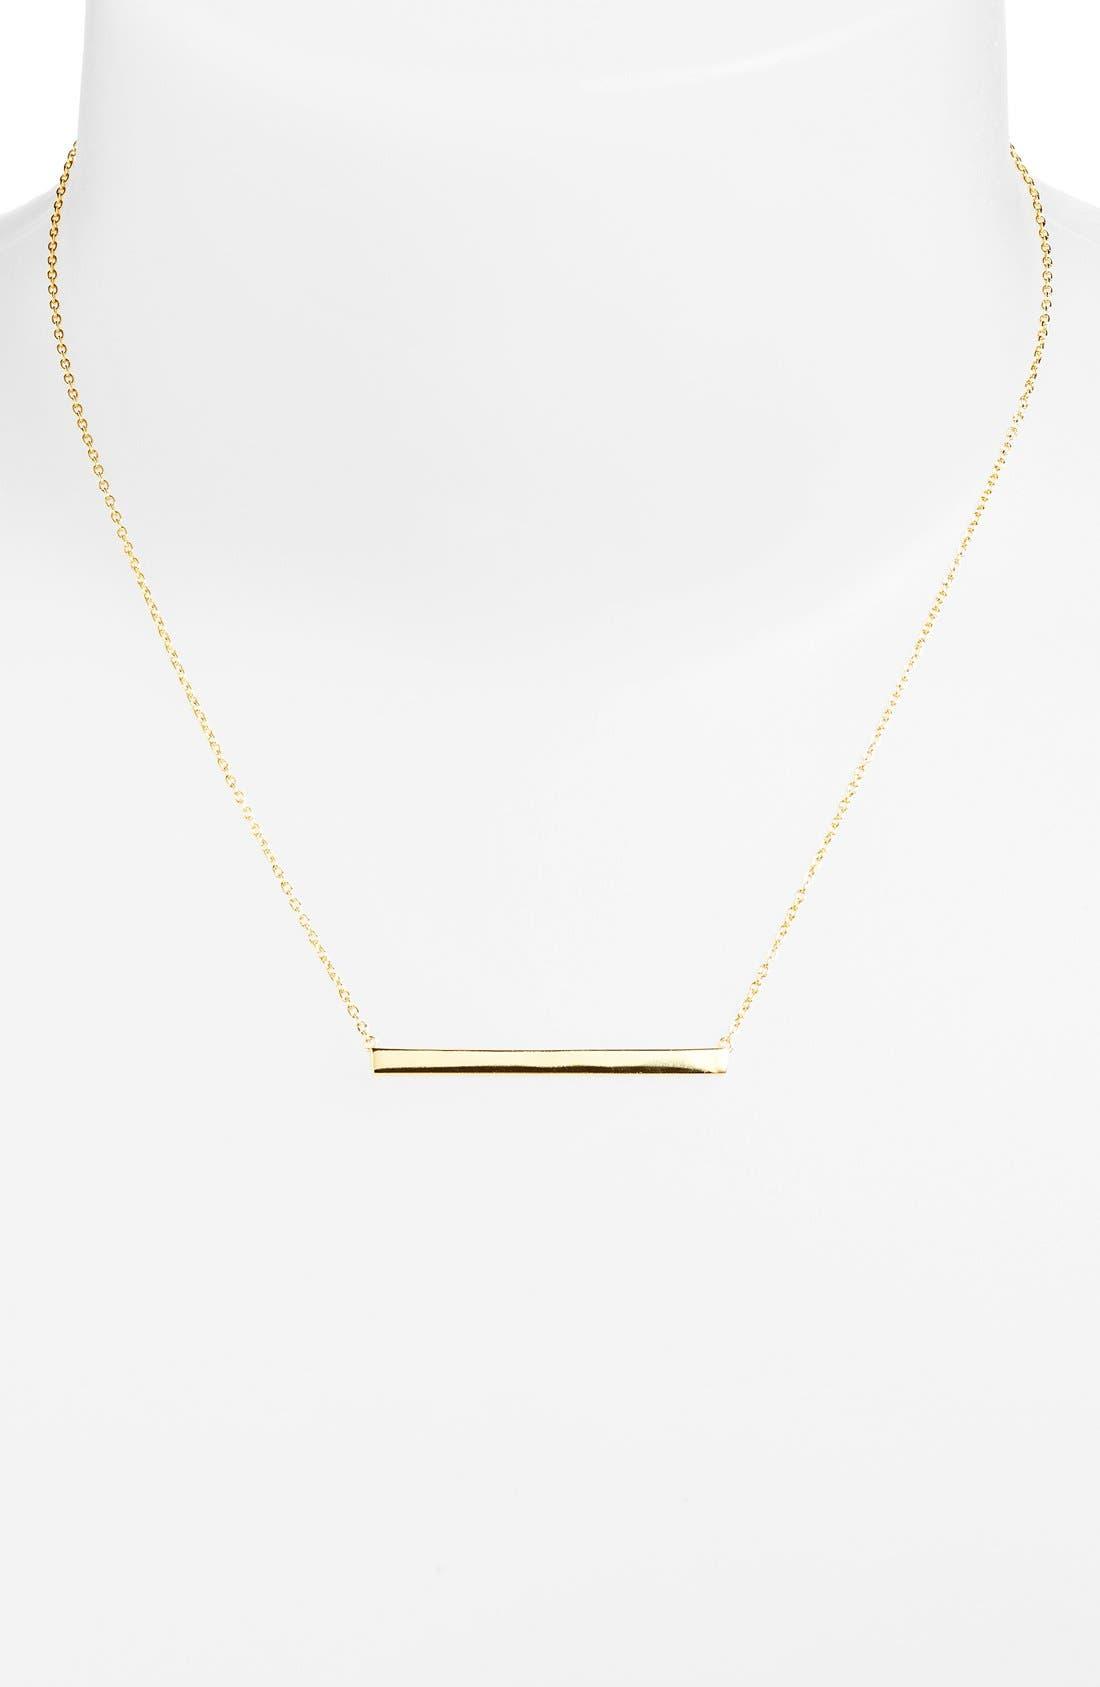 Bar Pendant Necklace,                             Alternate thumbnail 4, color,                             GOLD